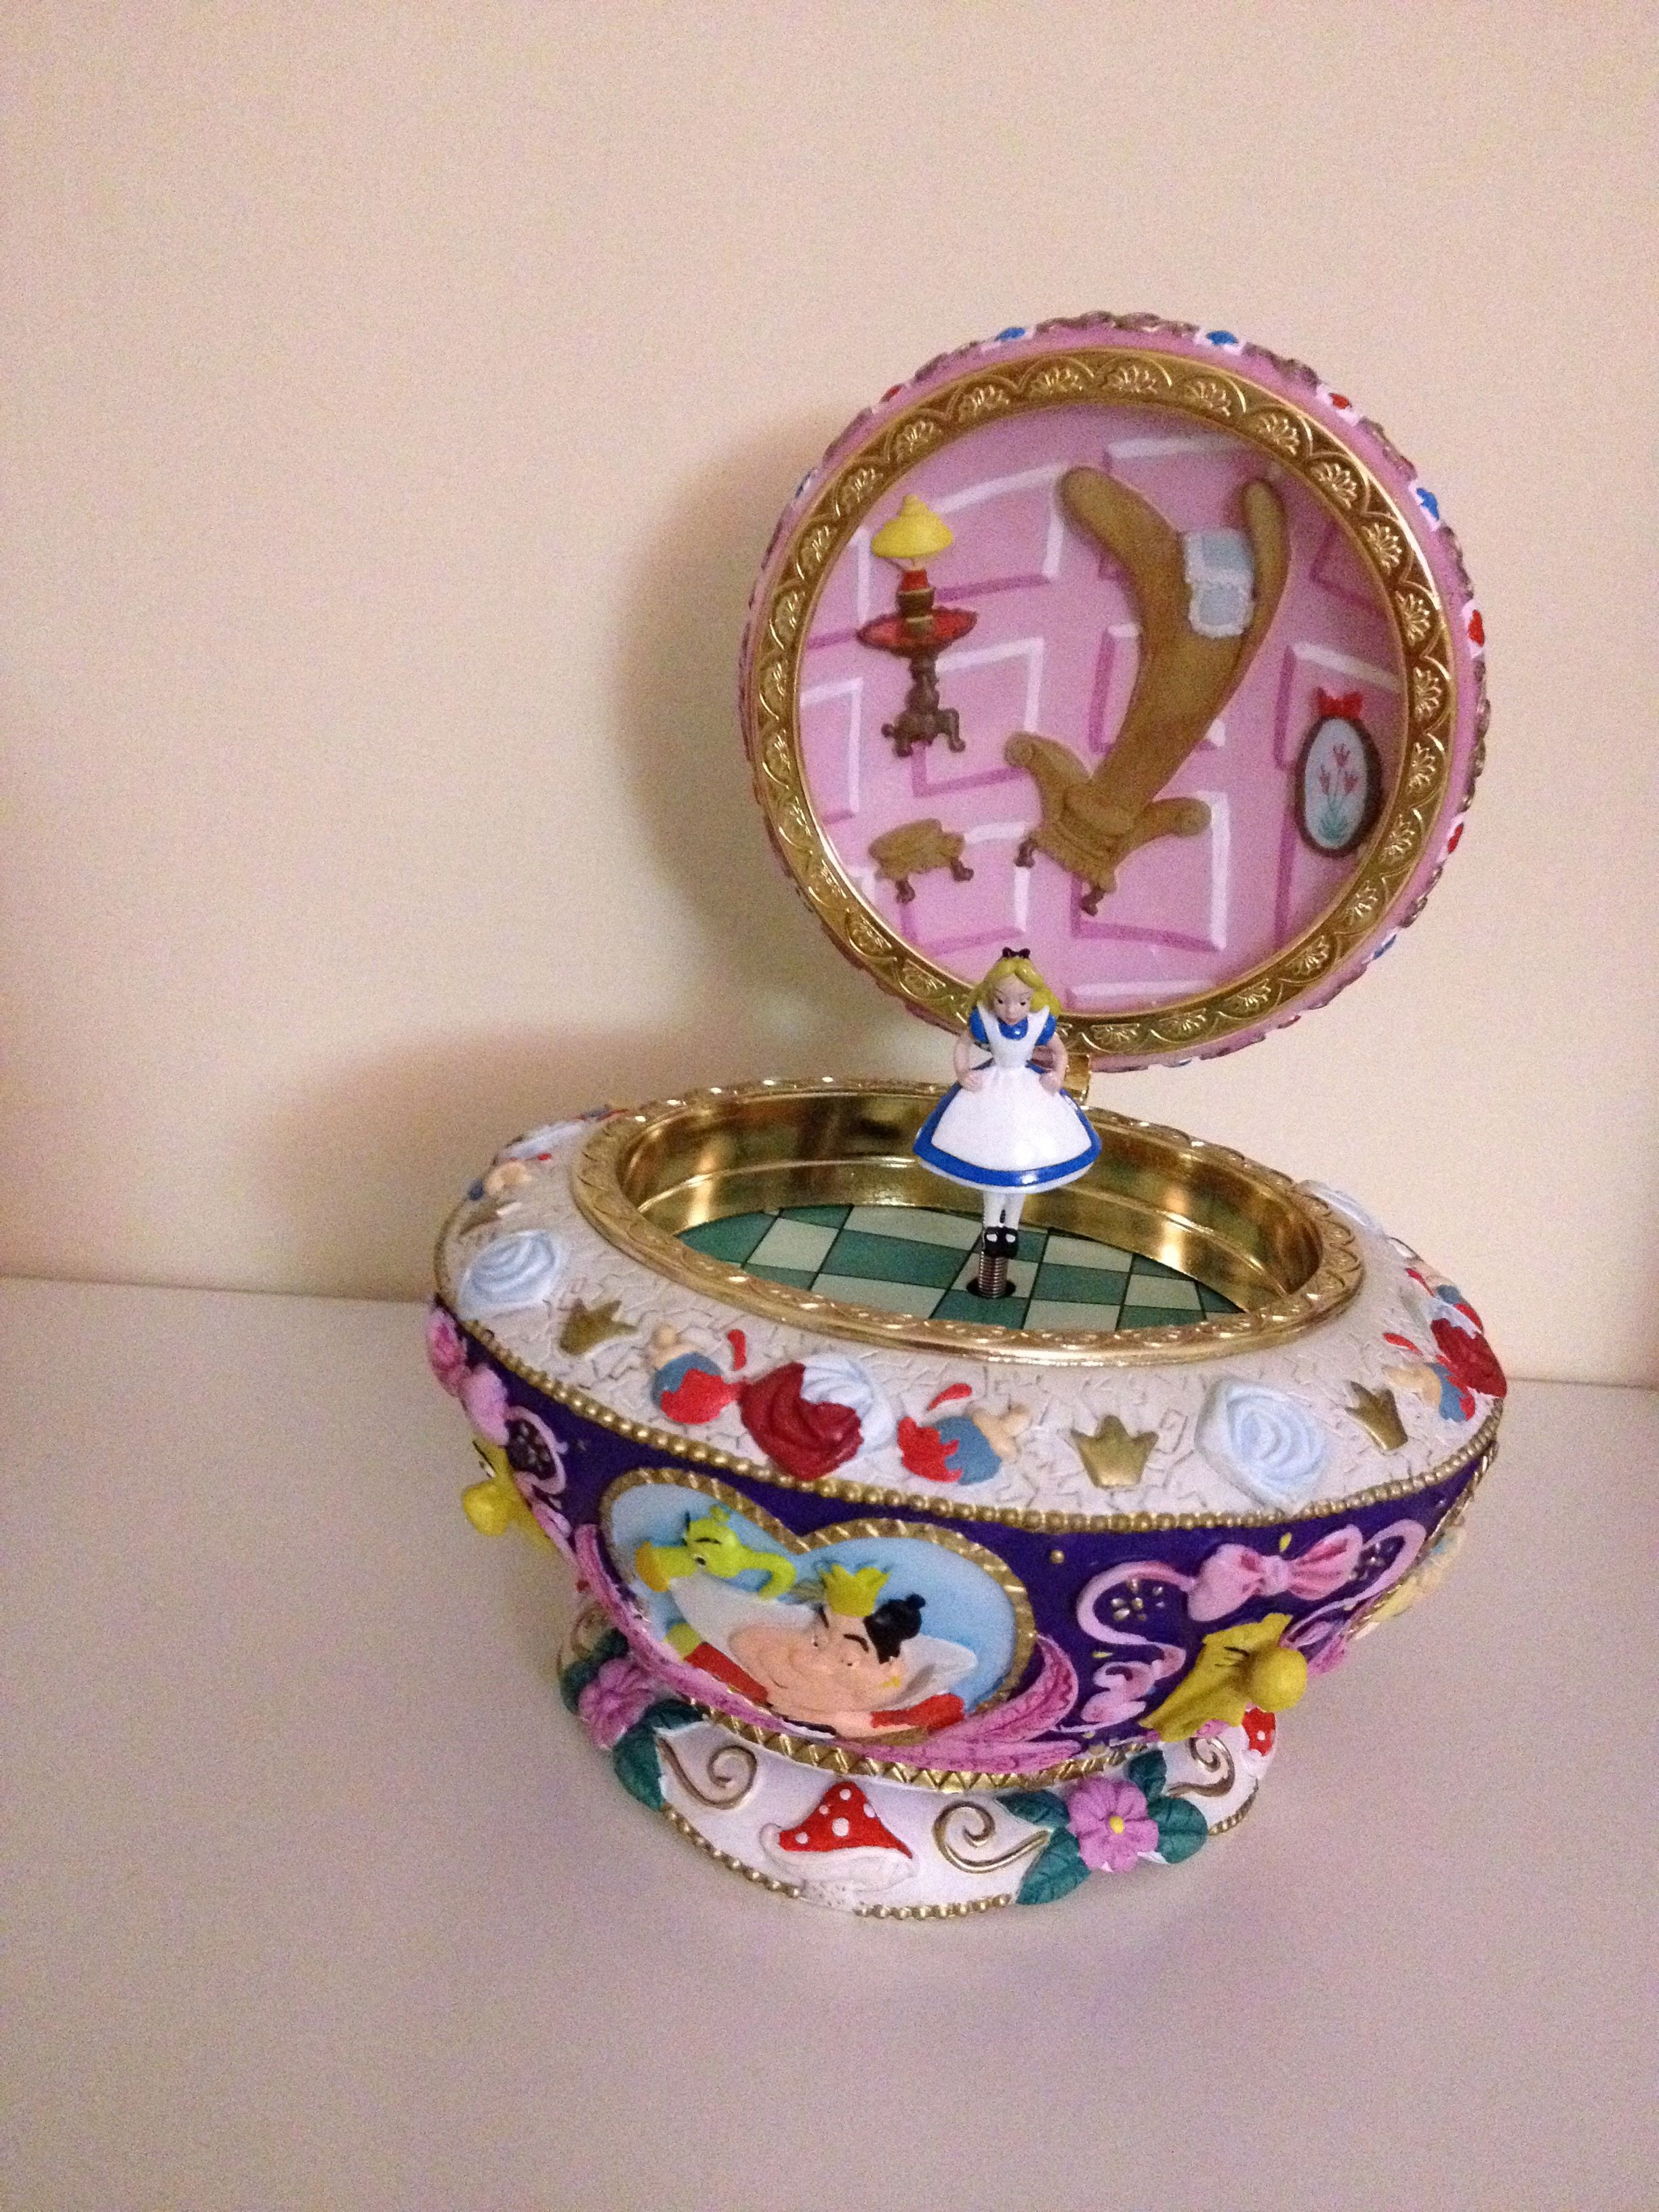 Disney Music Box Musical Jewelry Alice In Wonderland Disney Jewelry Disney Music Box Music Box